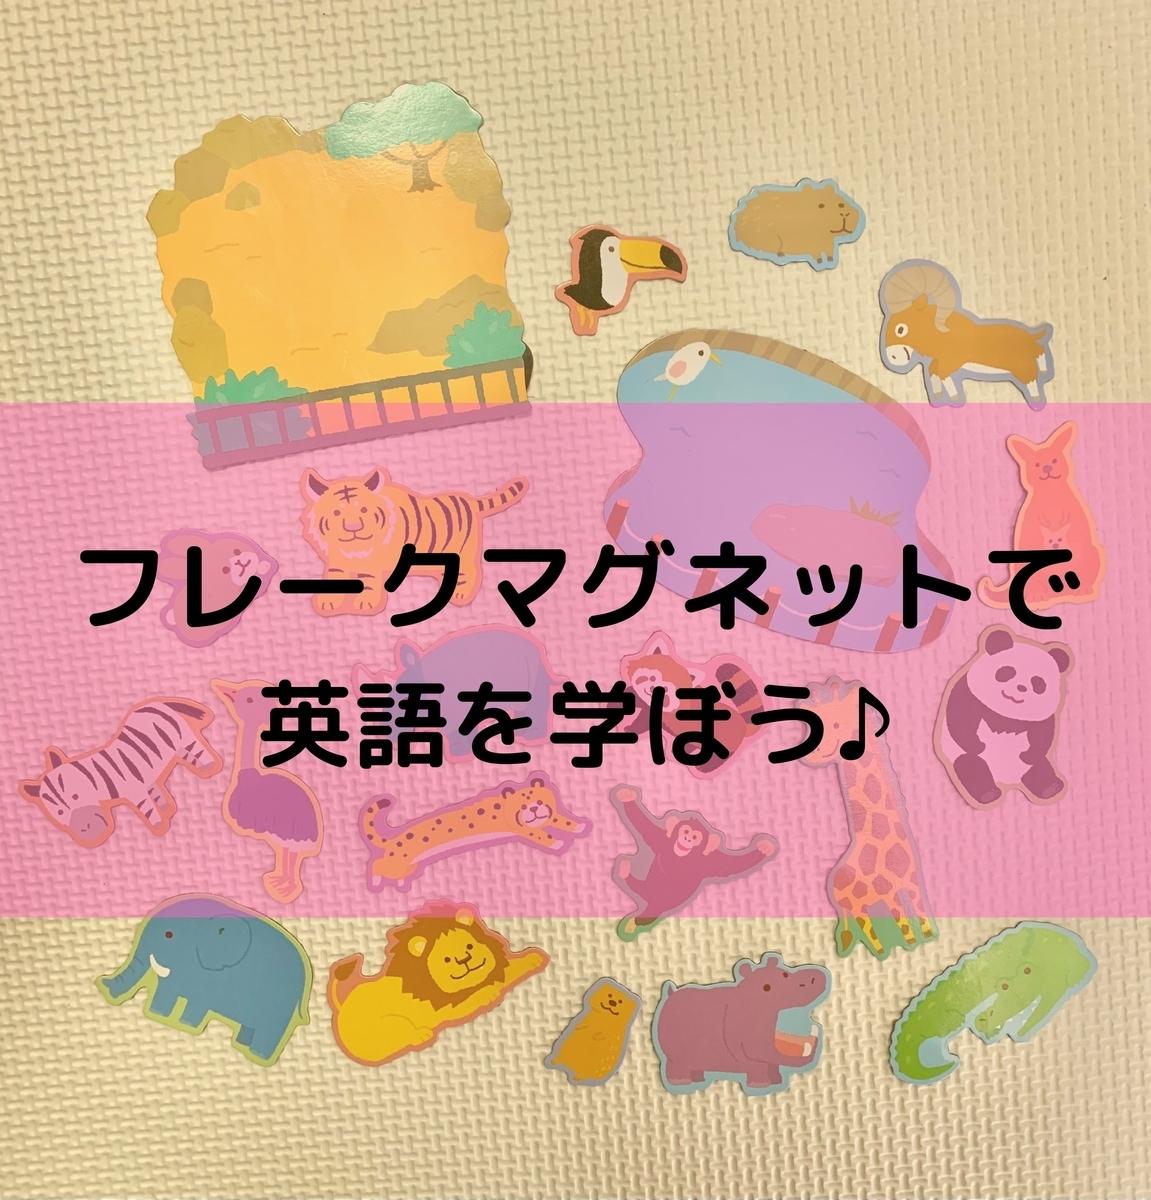 f:id:Hanashino:20210209170704j:plain